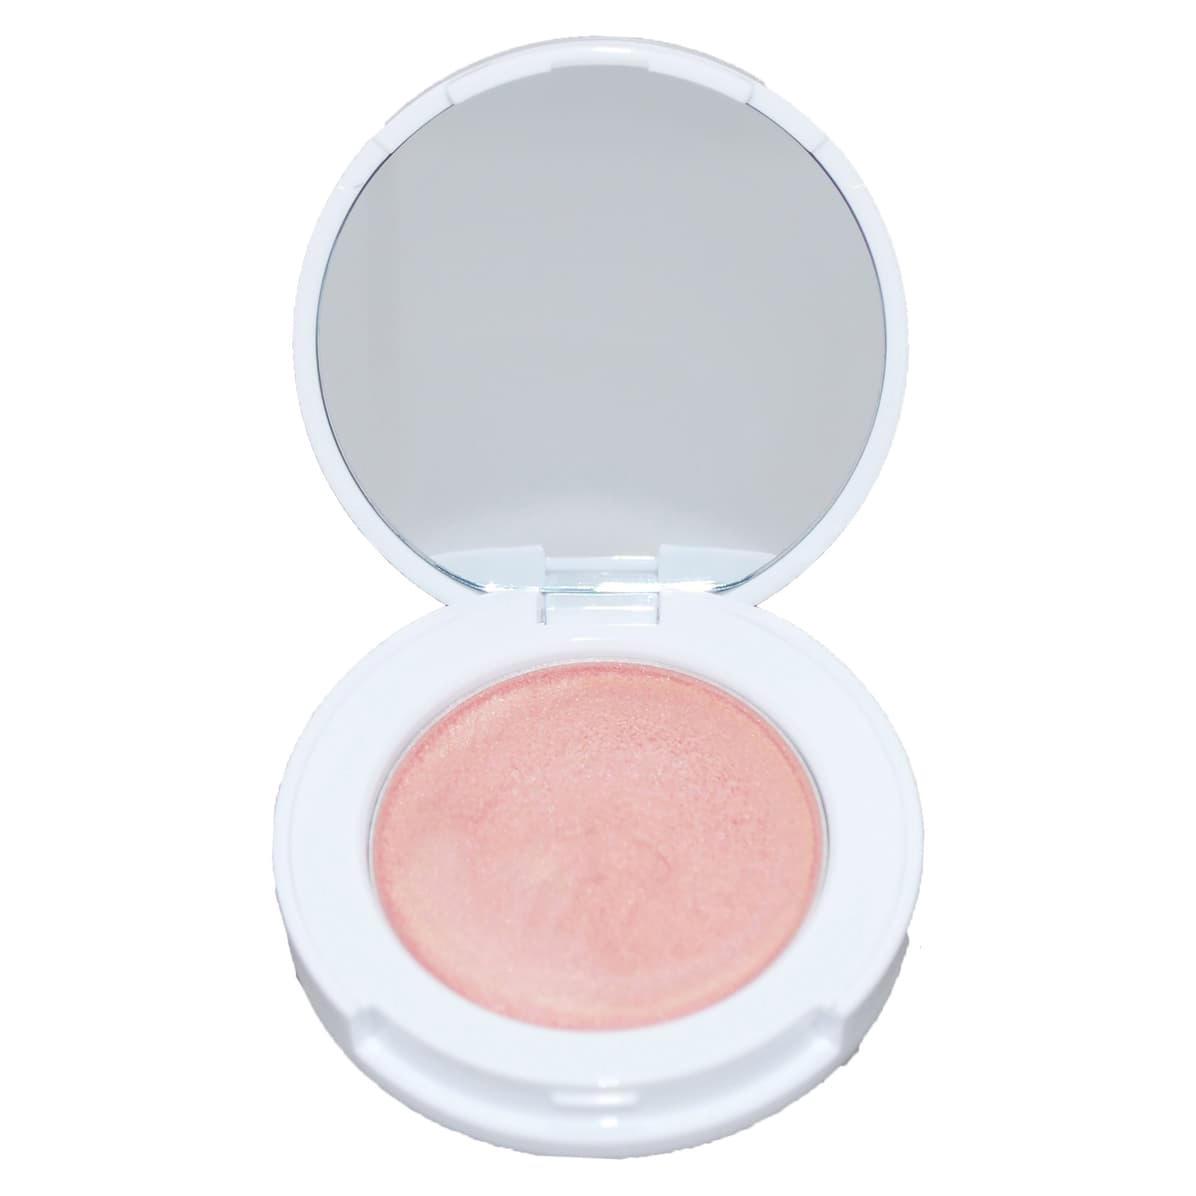 Winky Lux Strobing Balm Radiant Pink